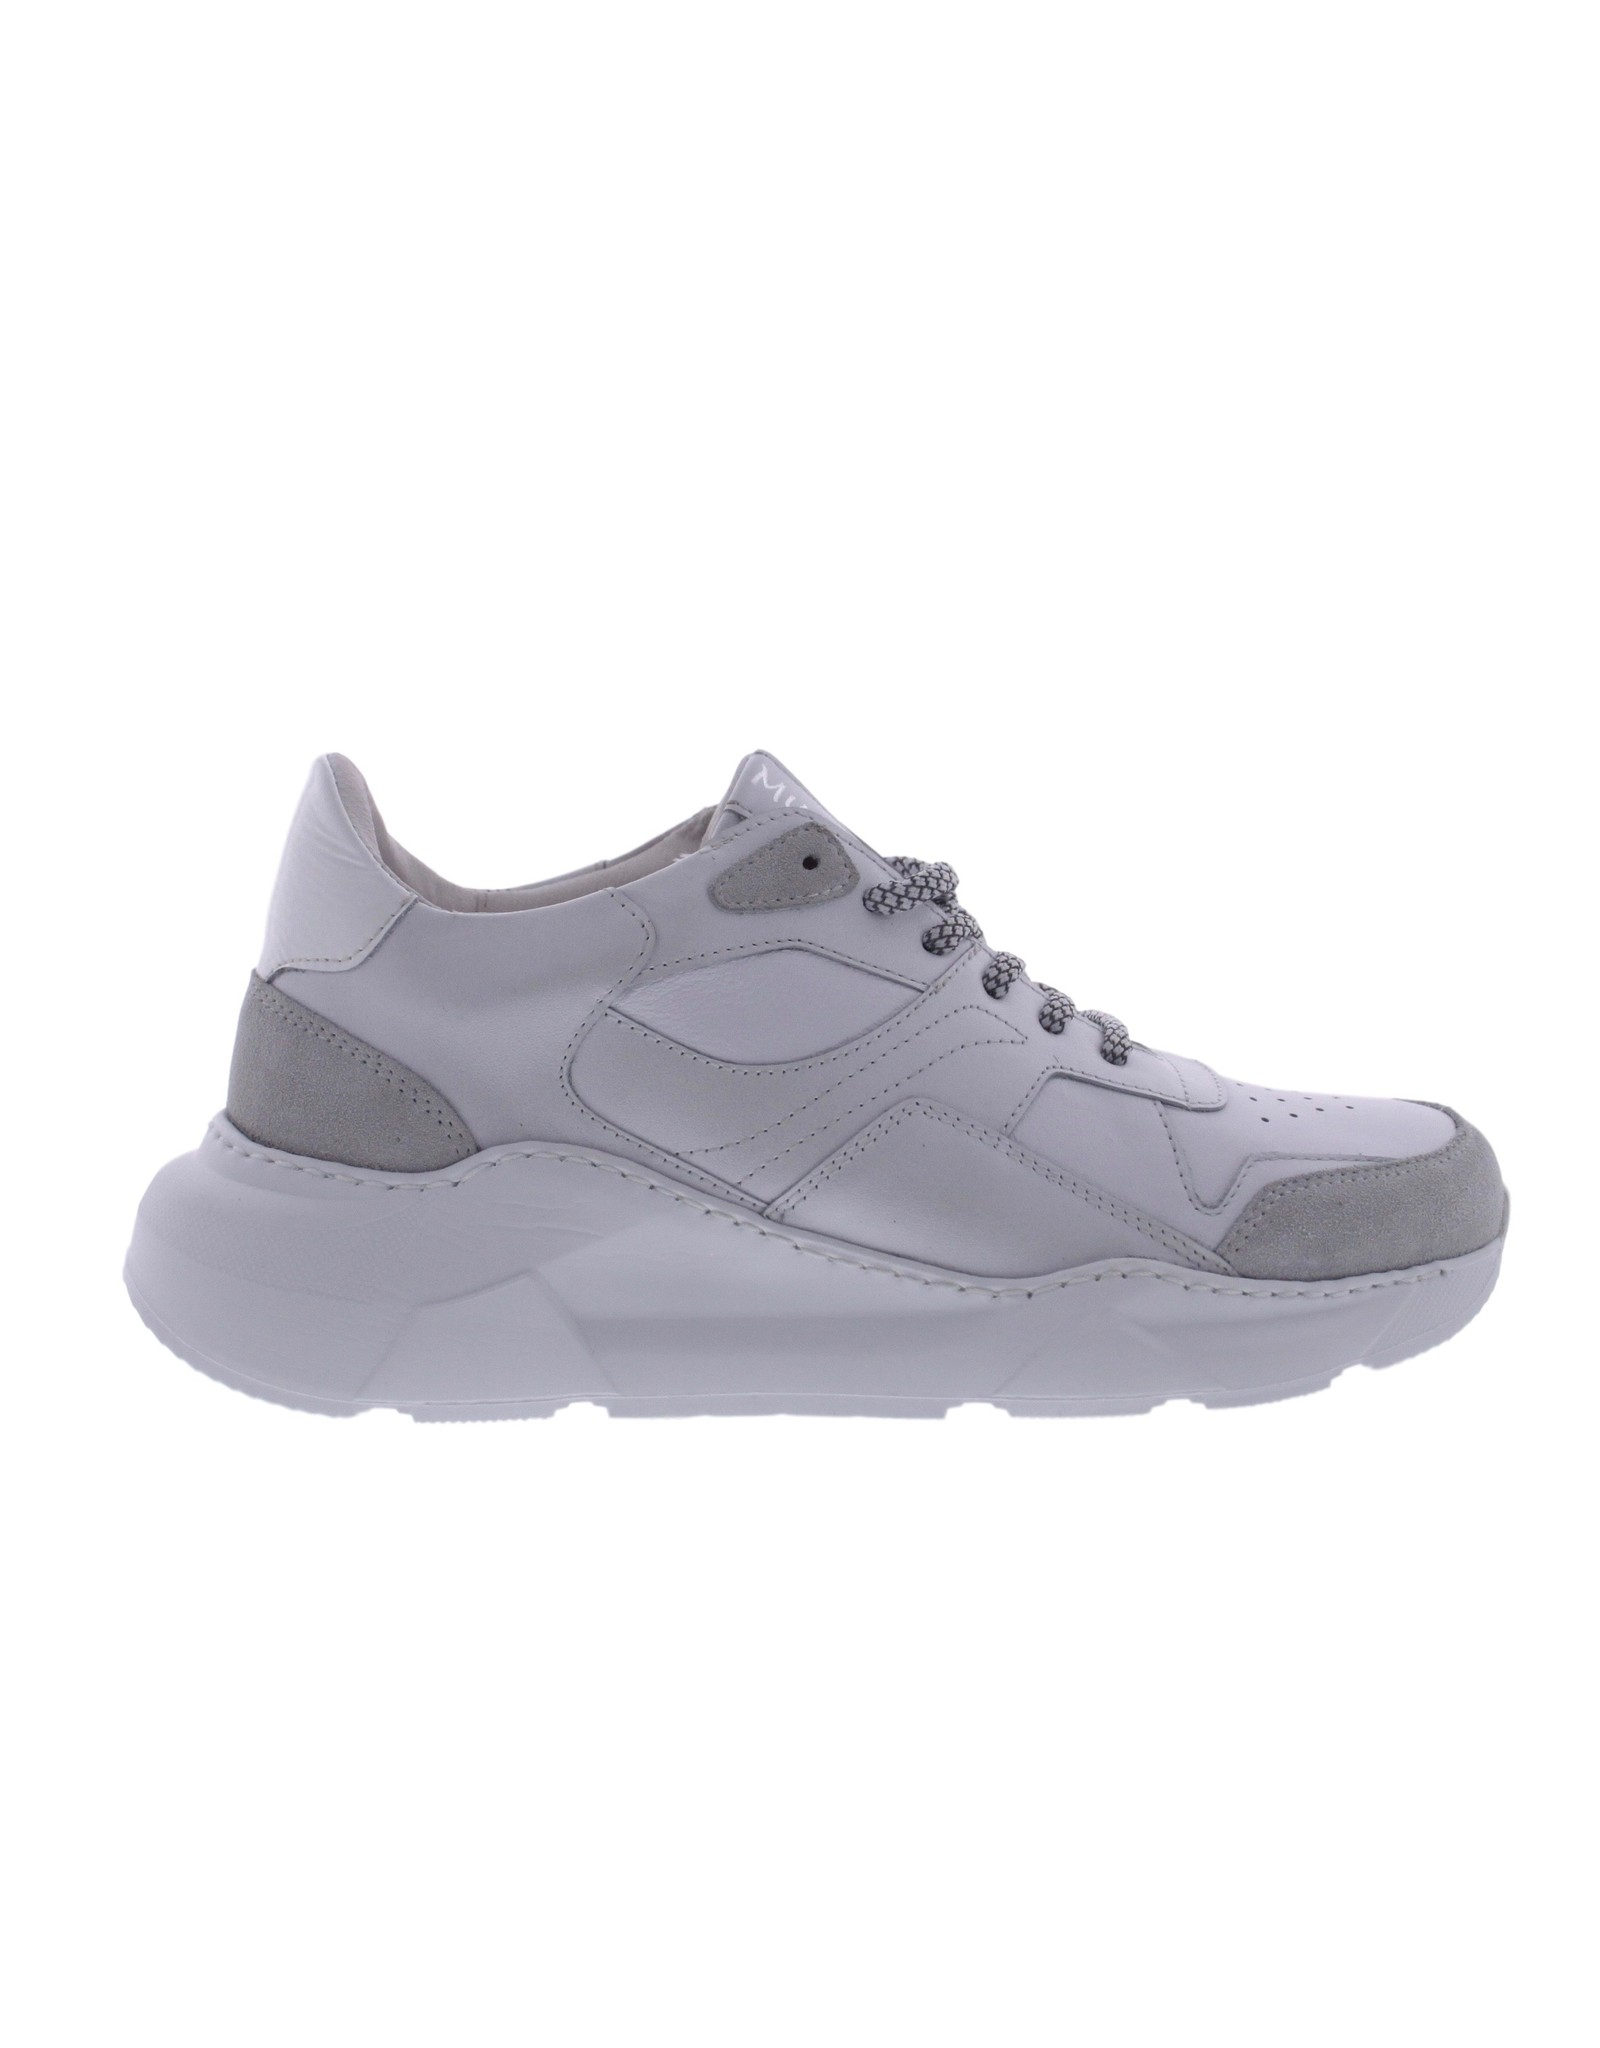 Muoviti Muoviti - Sneaker Wit